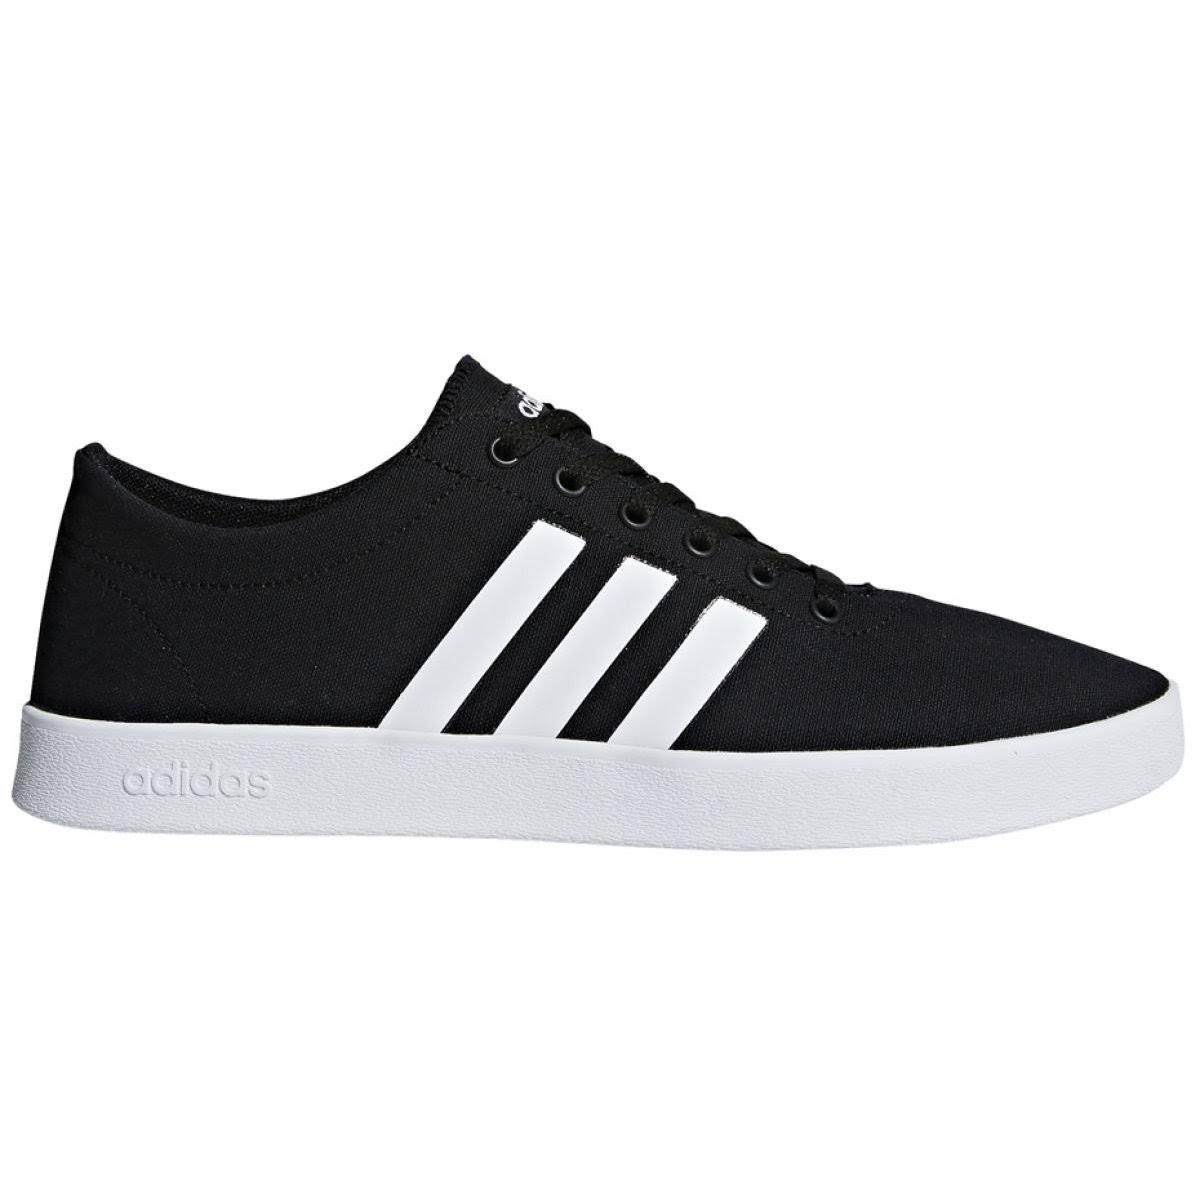 Adidas Easy Vulc 2.0 UK 8.5